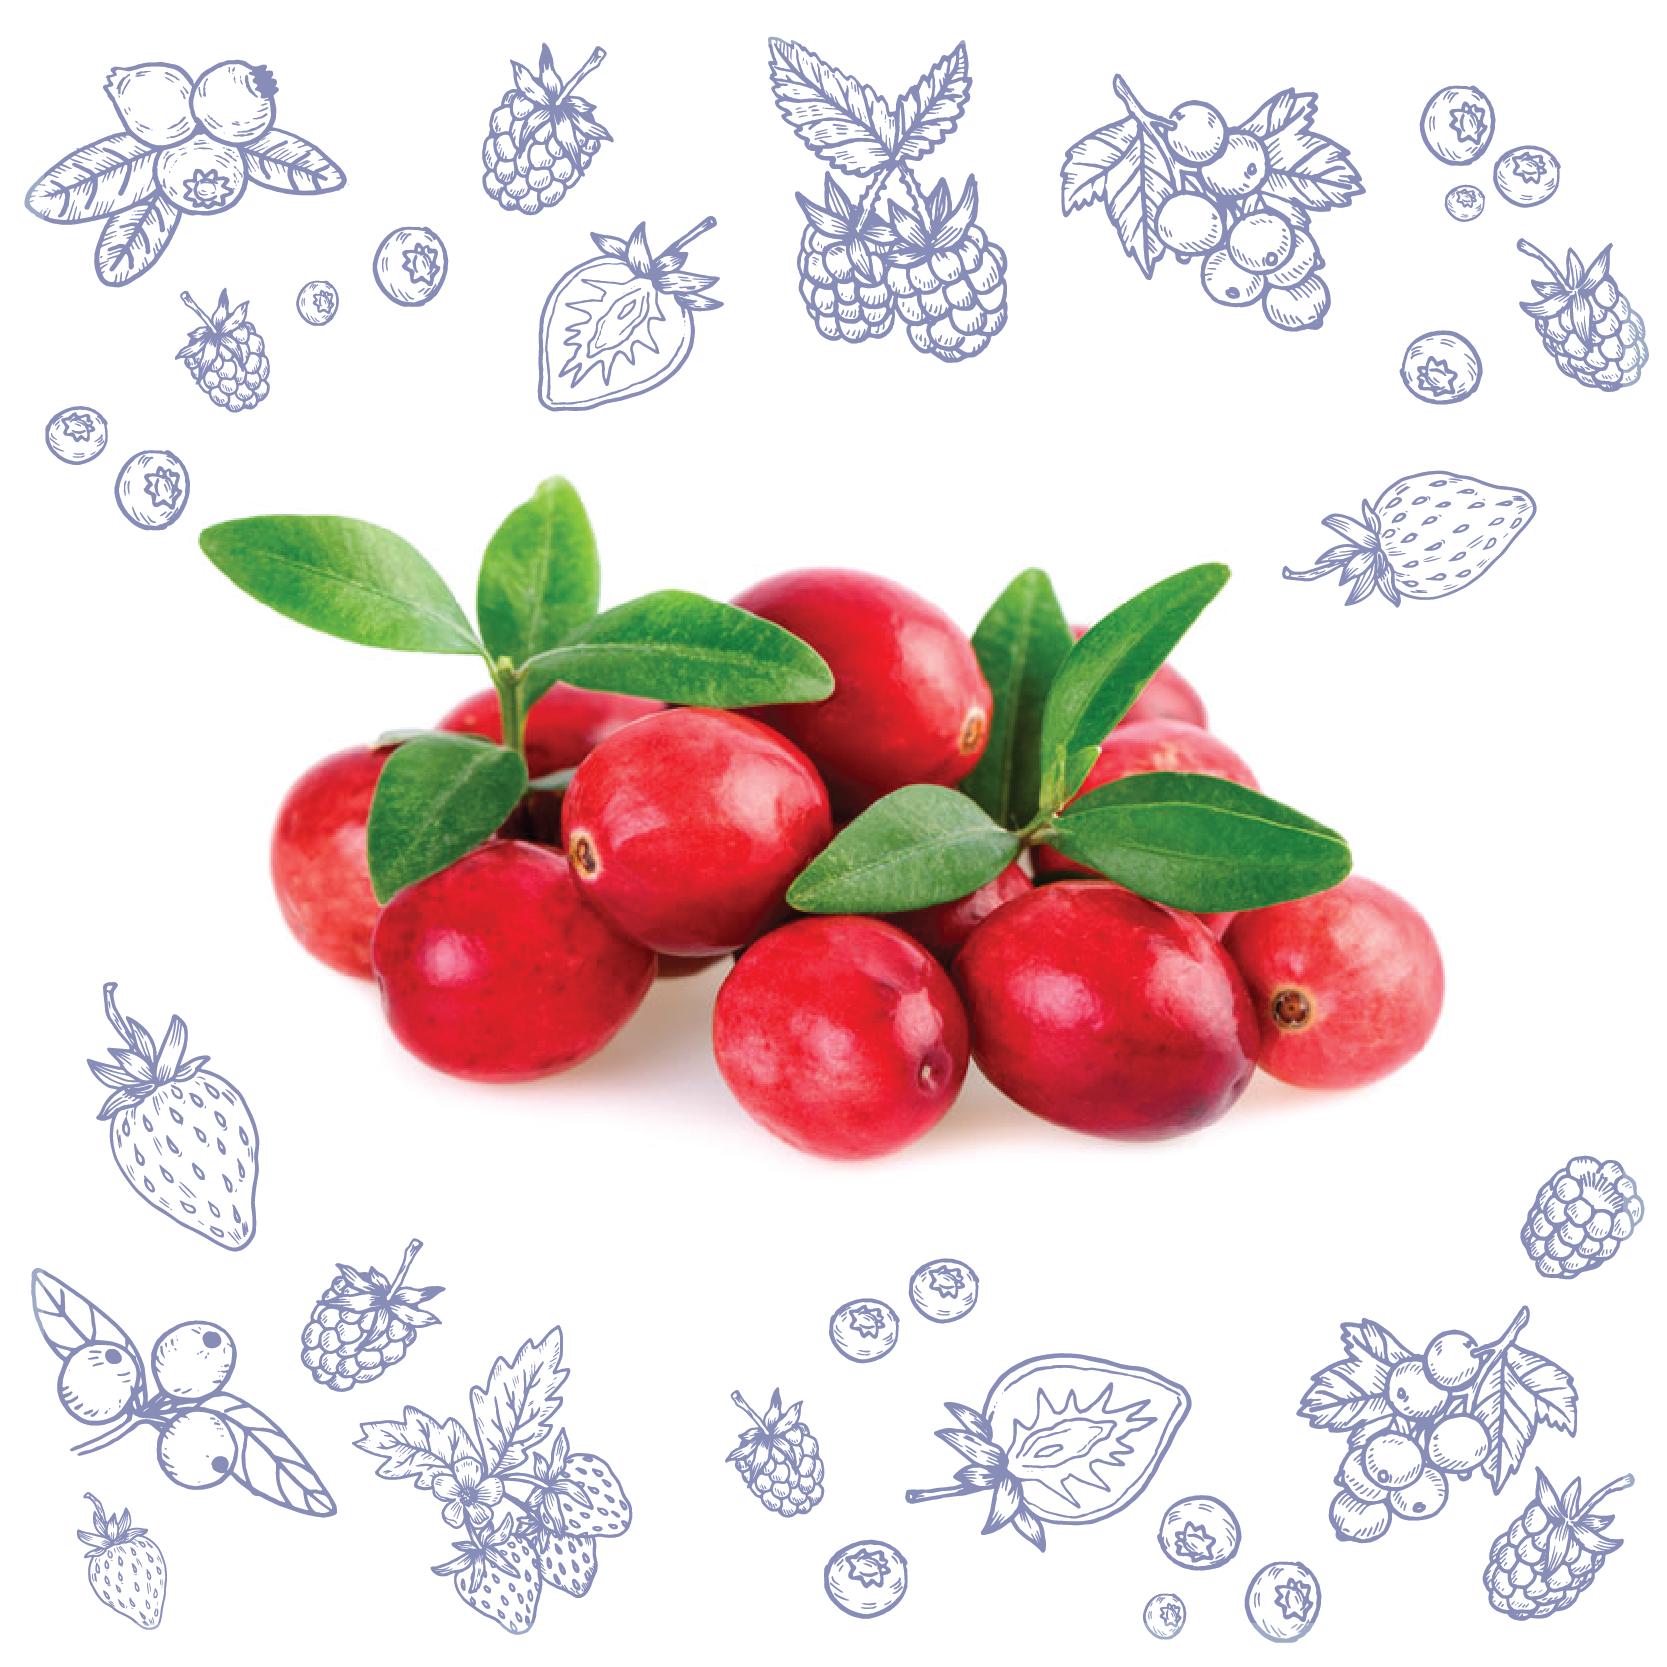 Polarica-Berries-ktranbar